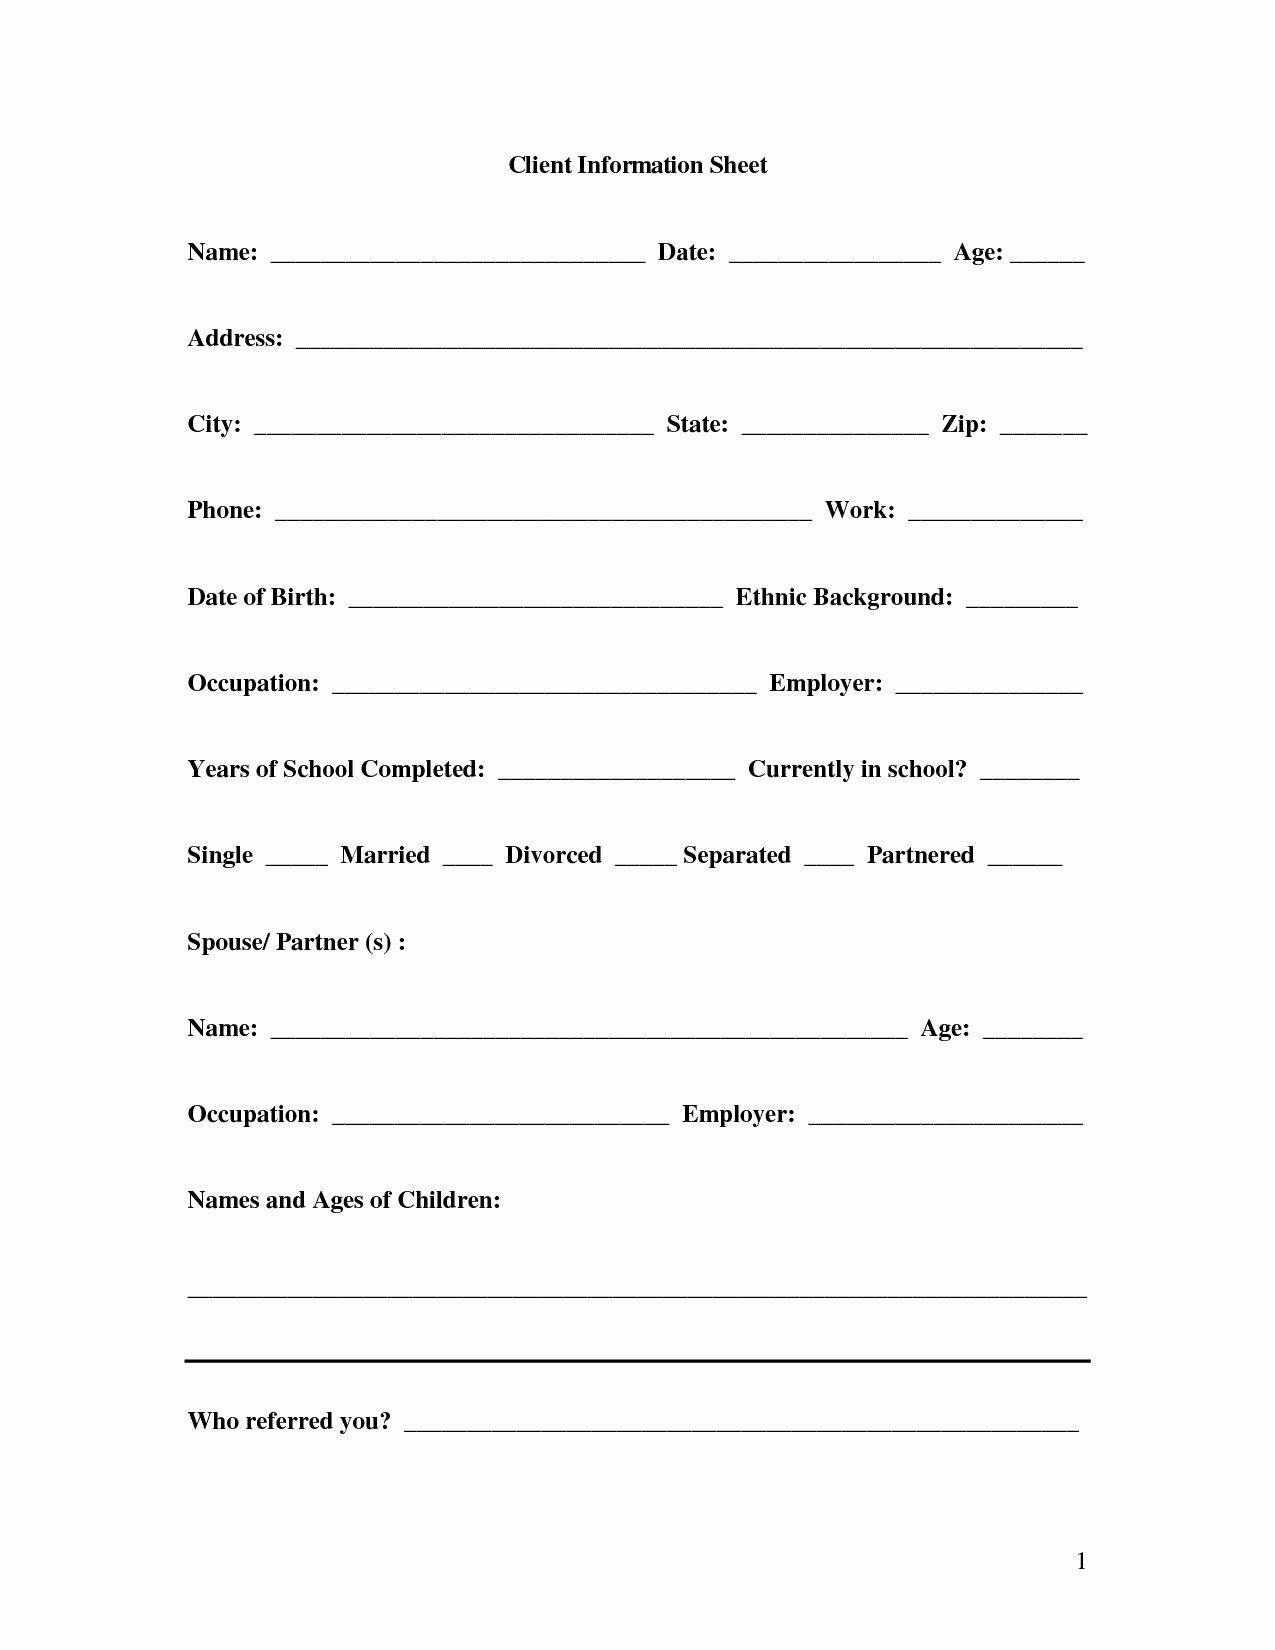 004 Unusual New Customer Form Template Word Photo  Registration Account FeedbackFull